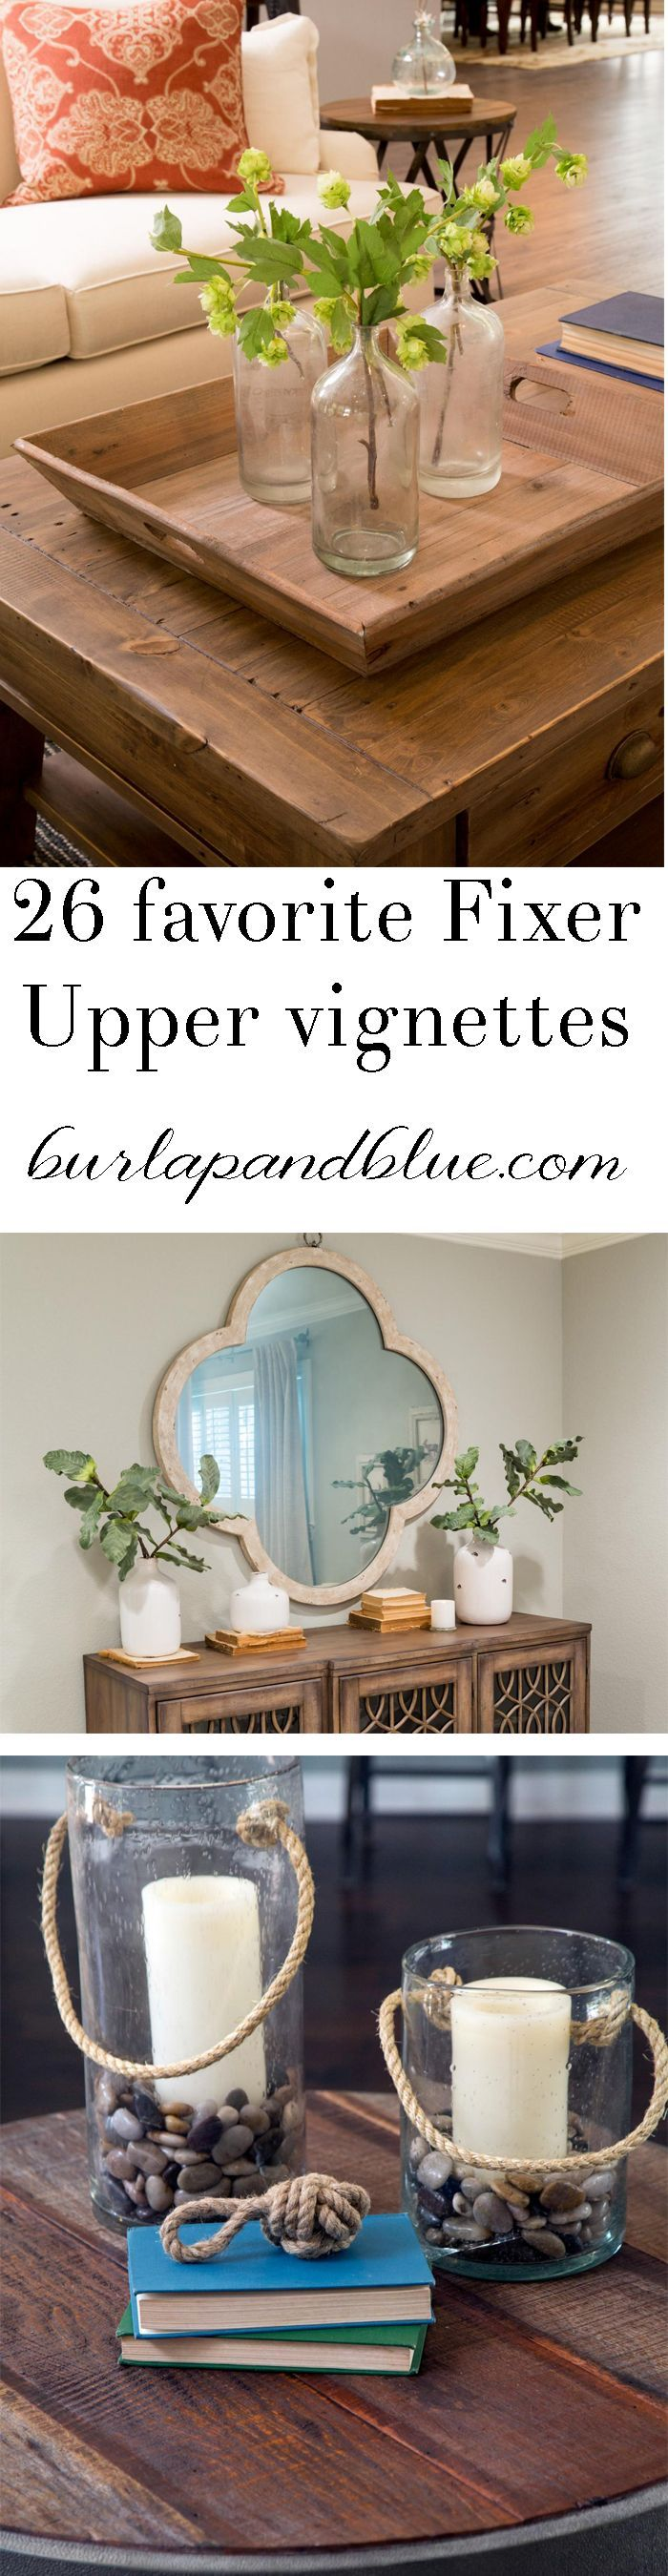 Hometalk diy christmas window decoration - 26 Favorite Fixer Upper Vignettes Tablescapes